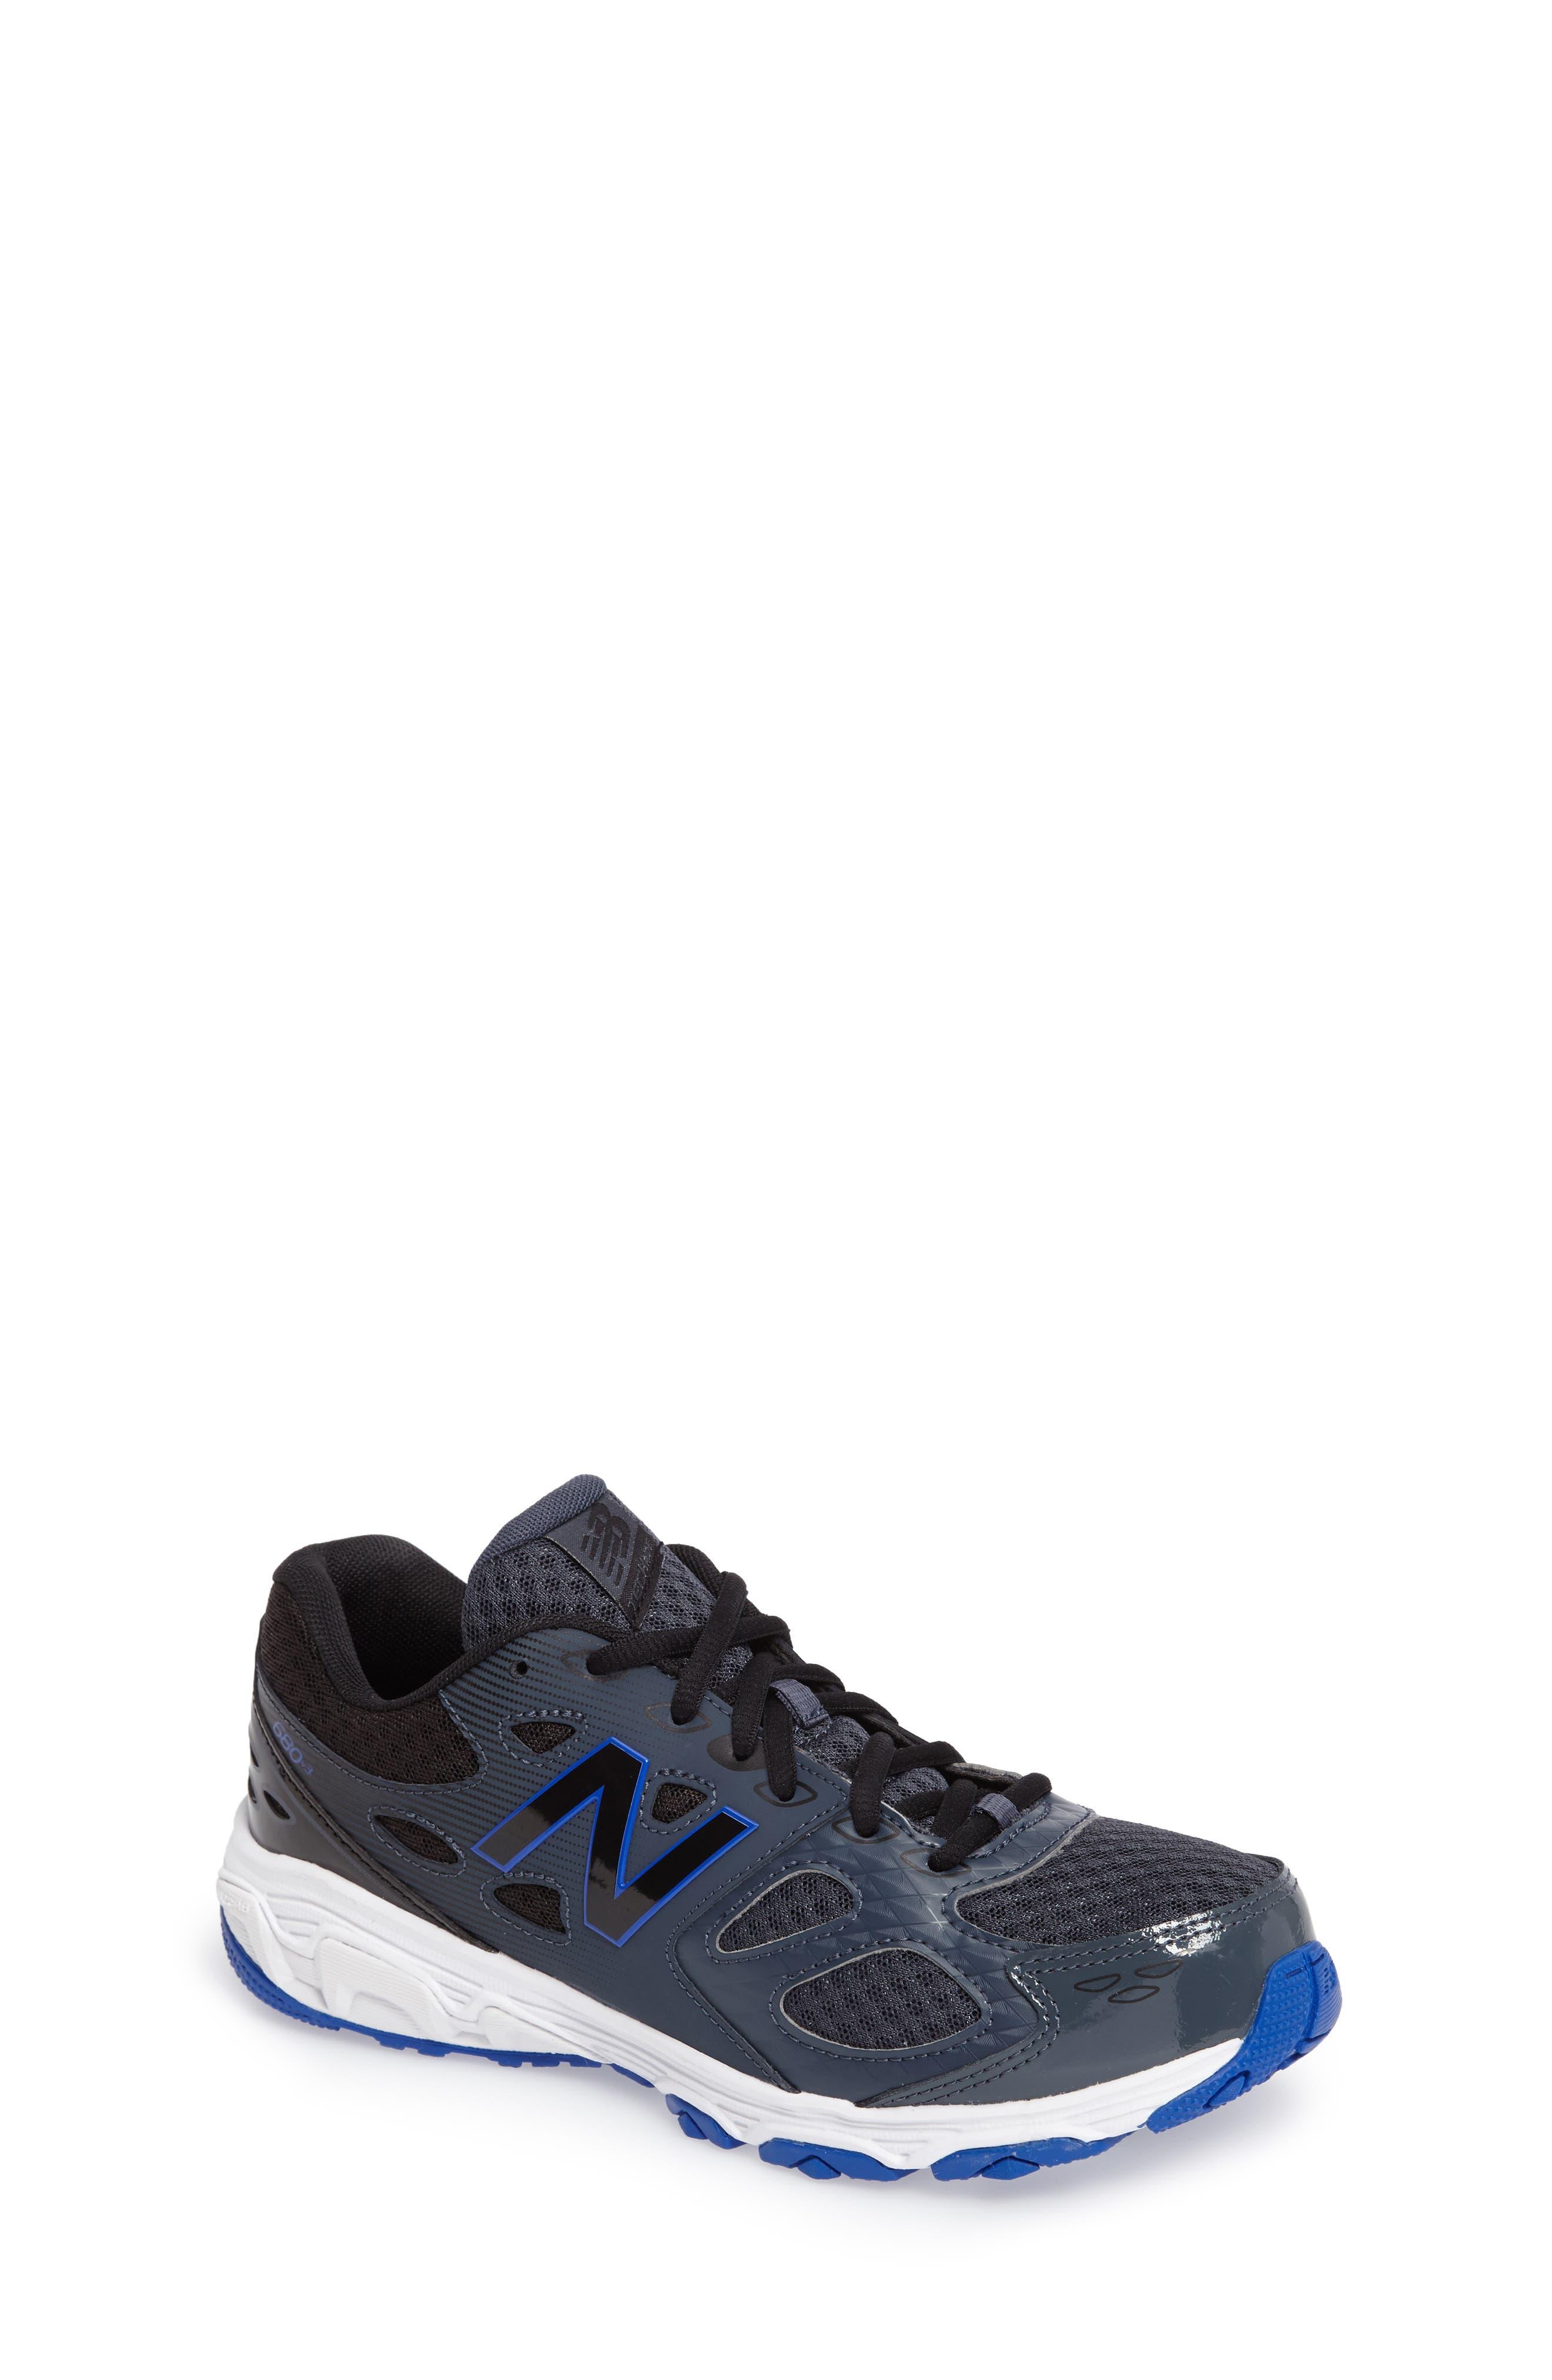 680v3 Sneaker,                             Main thumbnail 1, color,                             059